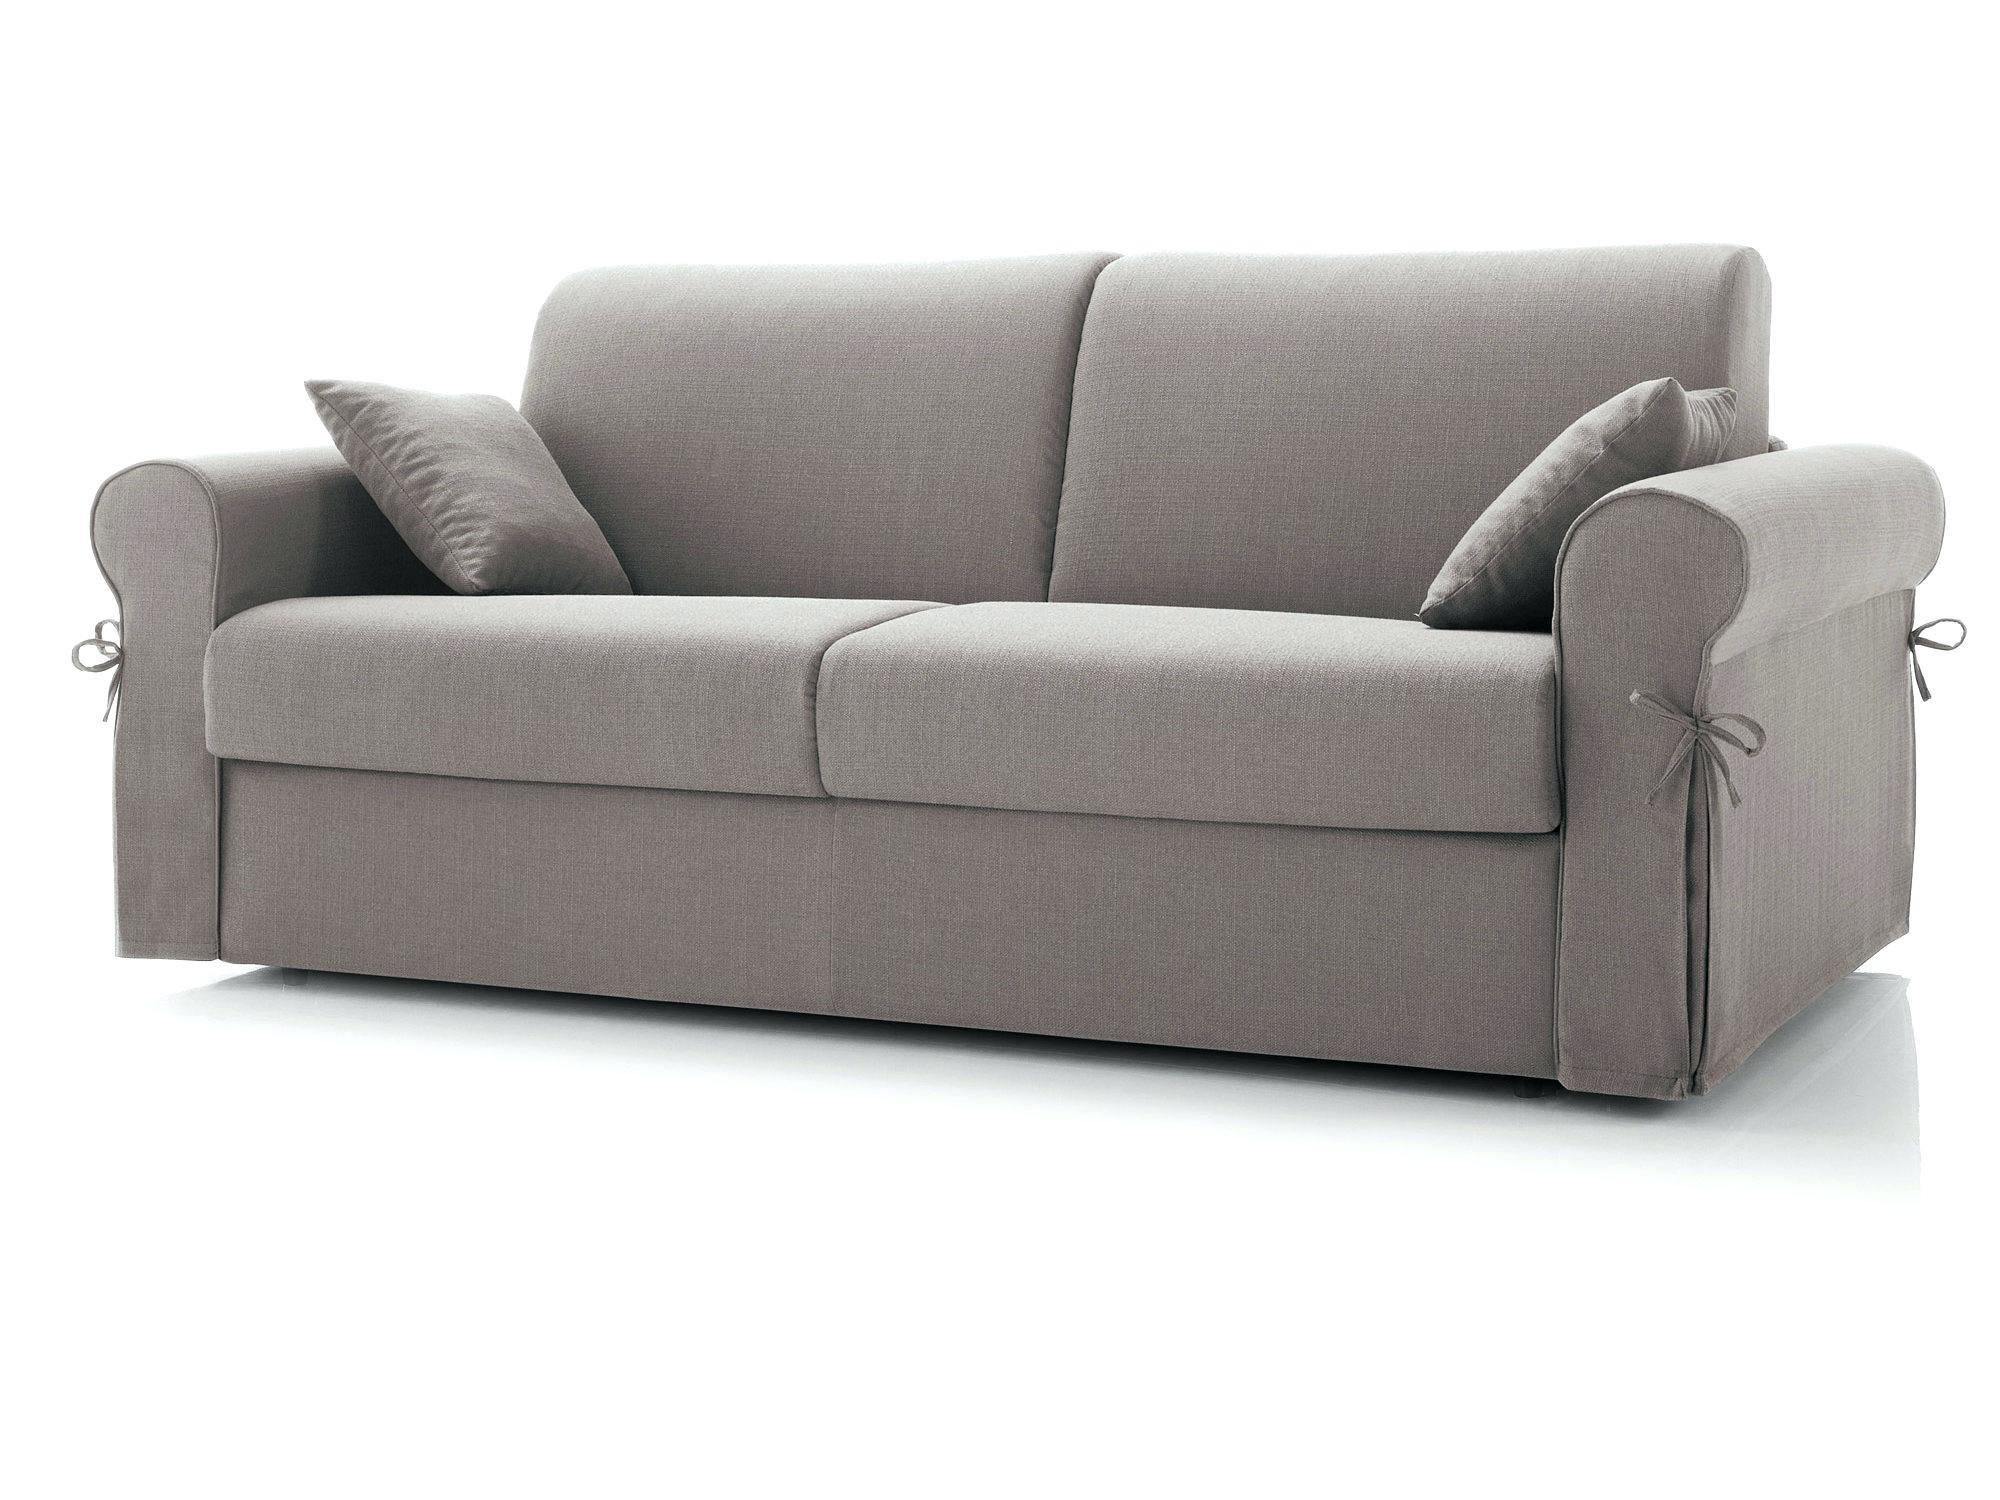 Canapé Cuir Convertible Conforama Meilleur De Images 45 Luxury Canape Angle Conforama